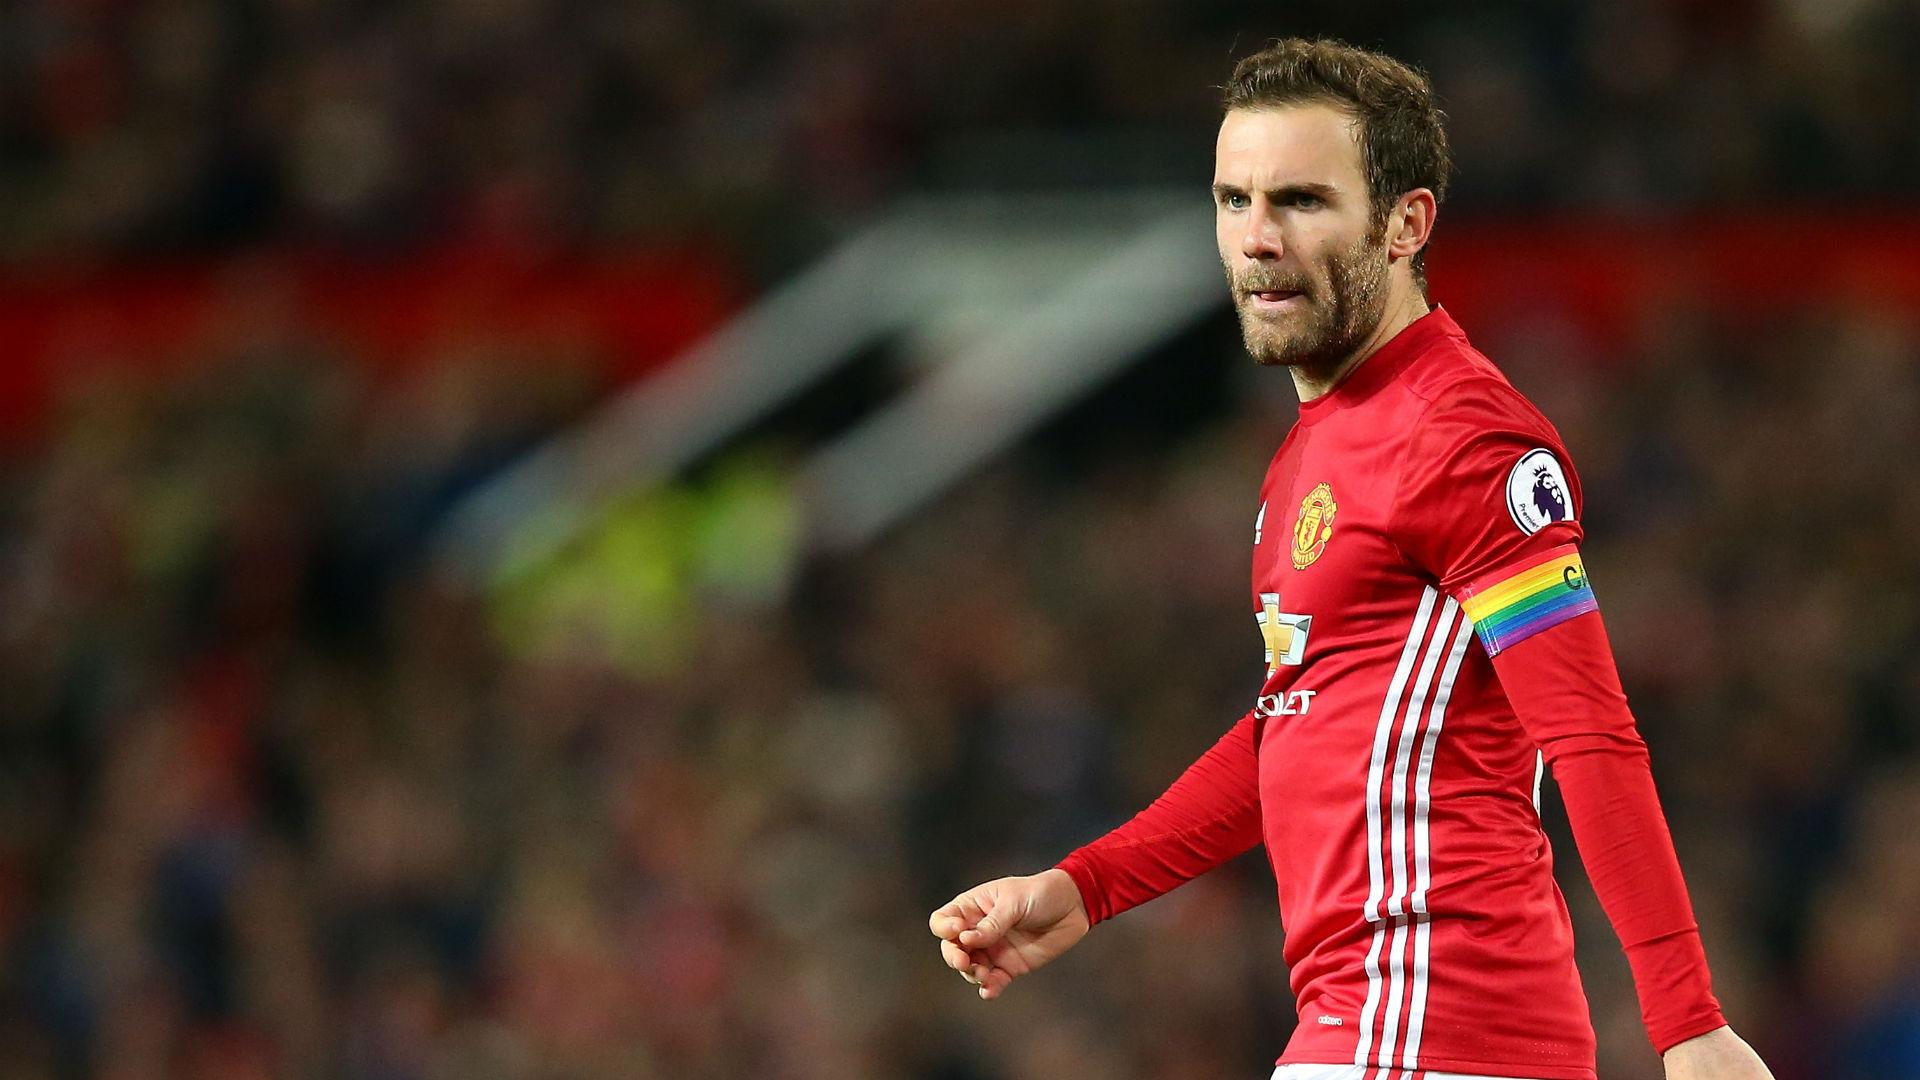 Man Utd's forgotten man? Mata needs to make the most of Mkhitaryan absence